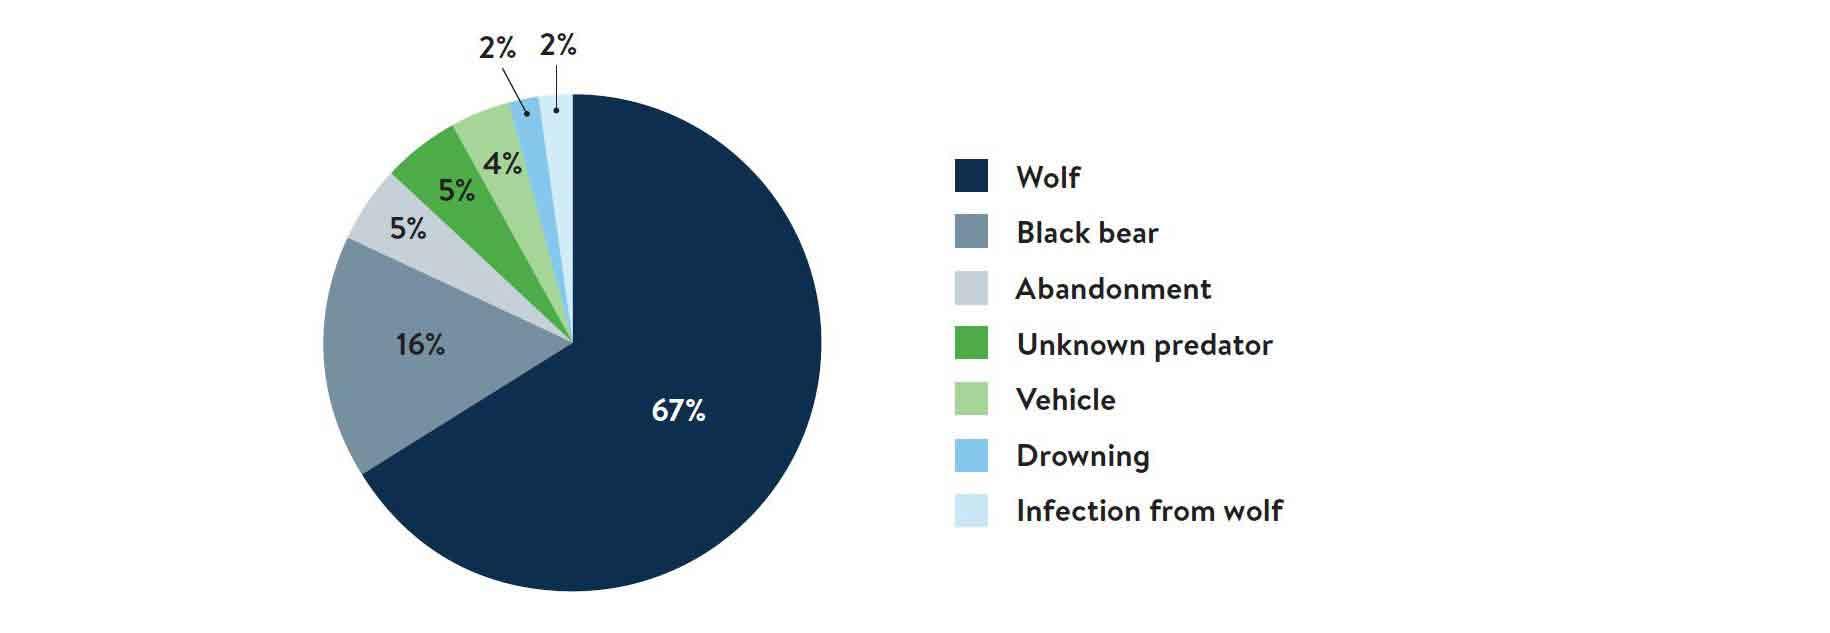 Causes of moose calf mortality 2013-2016